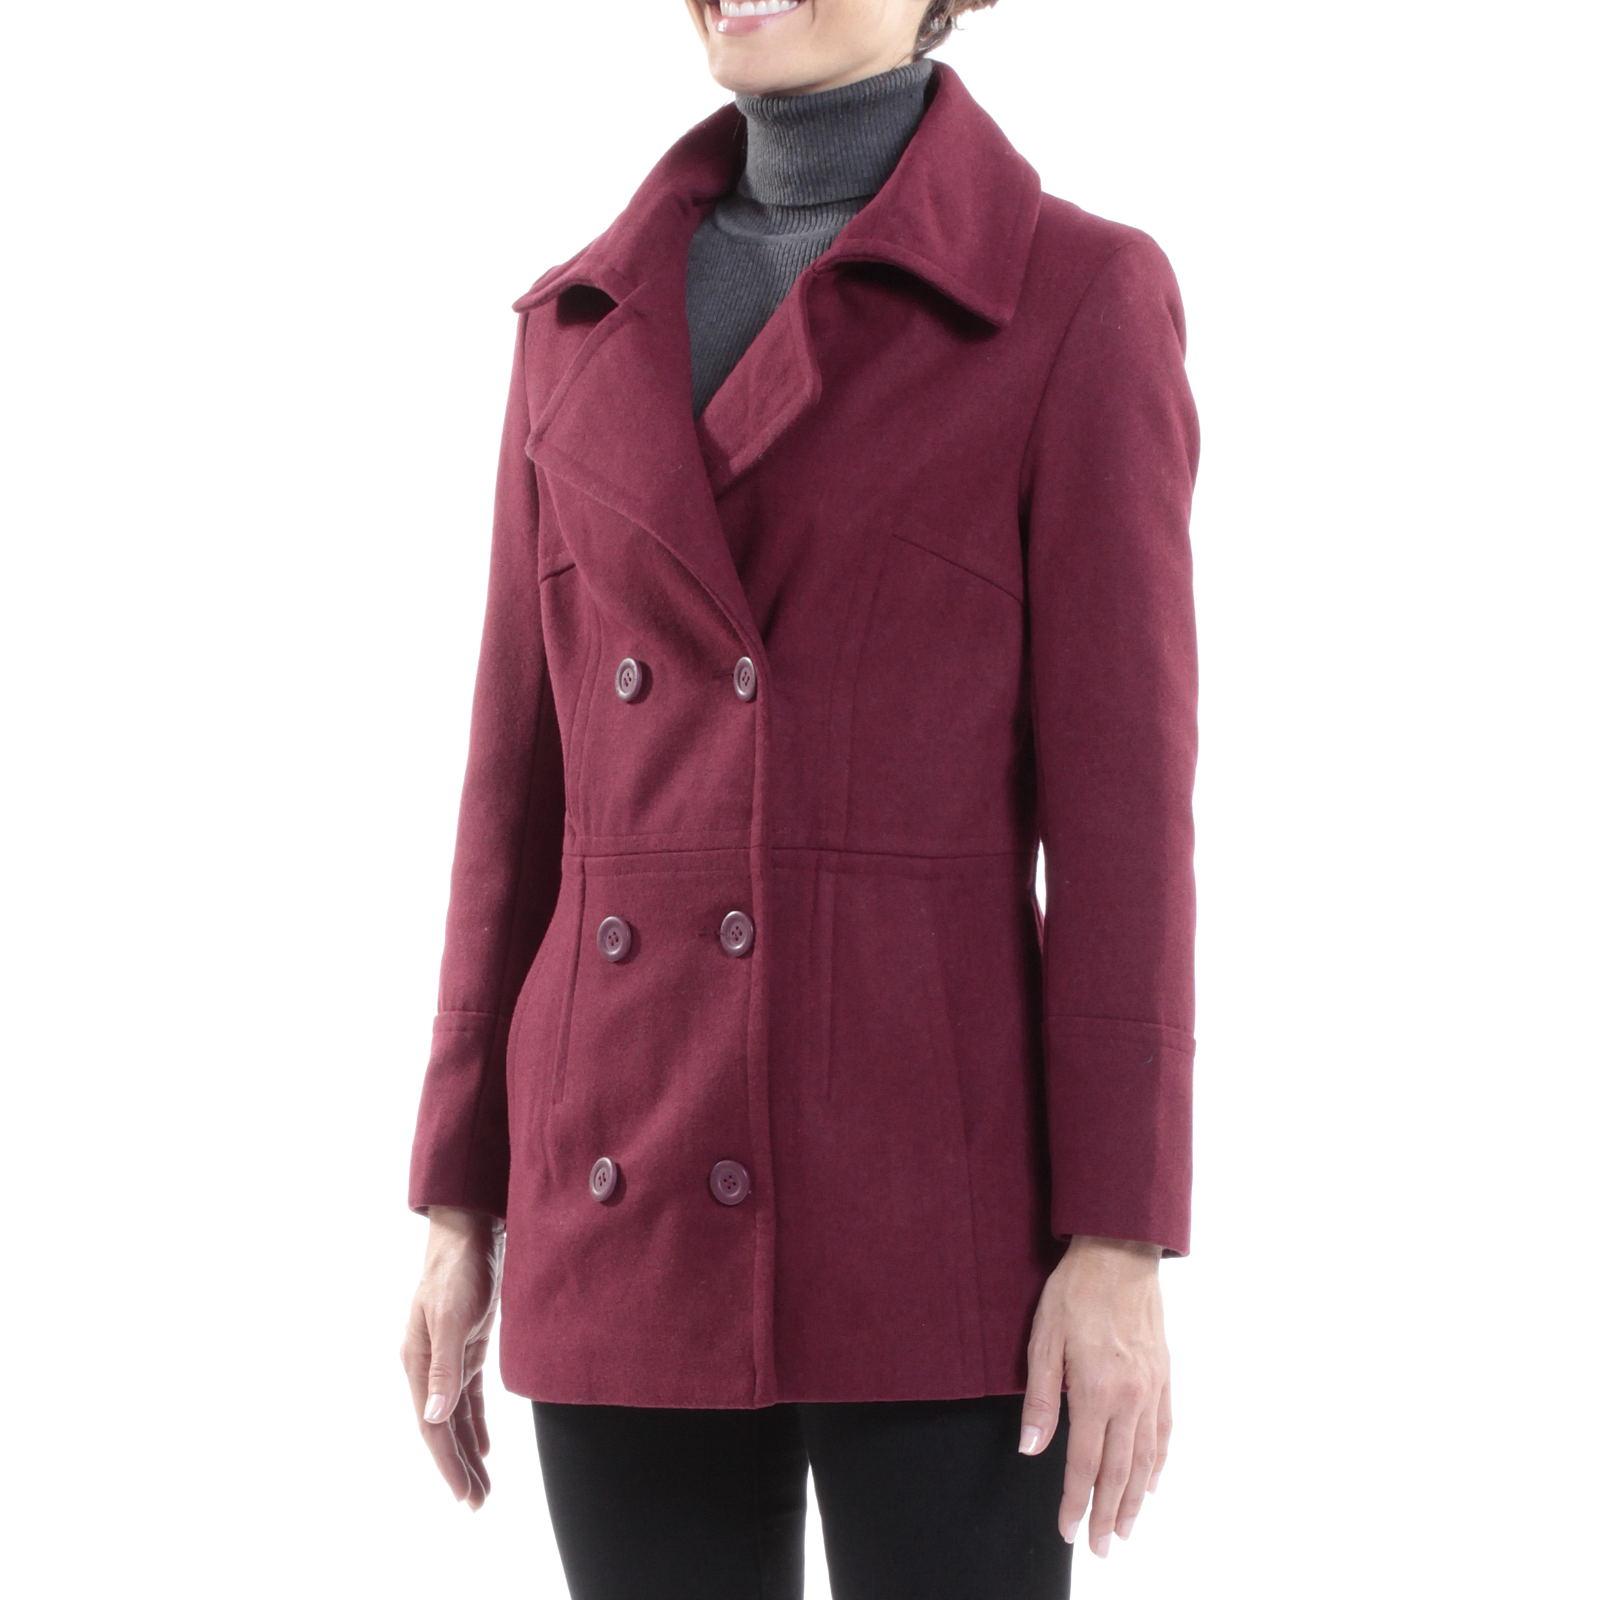 Alpine-Swiss-Emma-Womens-Peacoat-Jacket-Wool-Blazer-Double-Breasted-Overcoat-New thumbnail 31